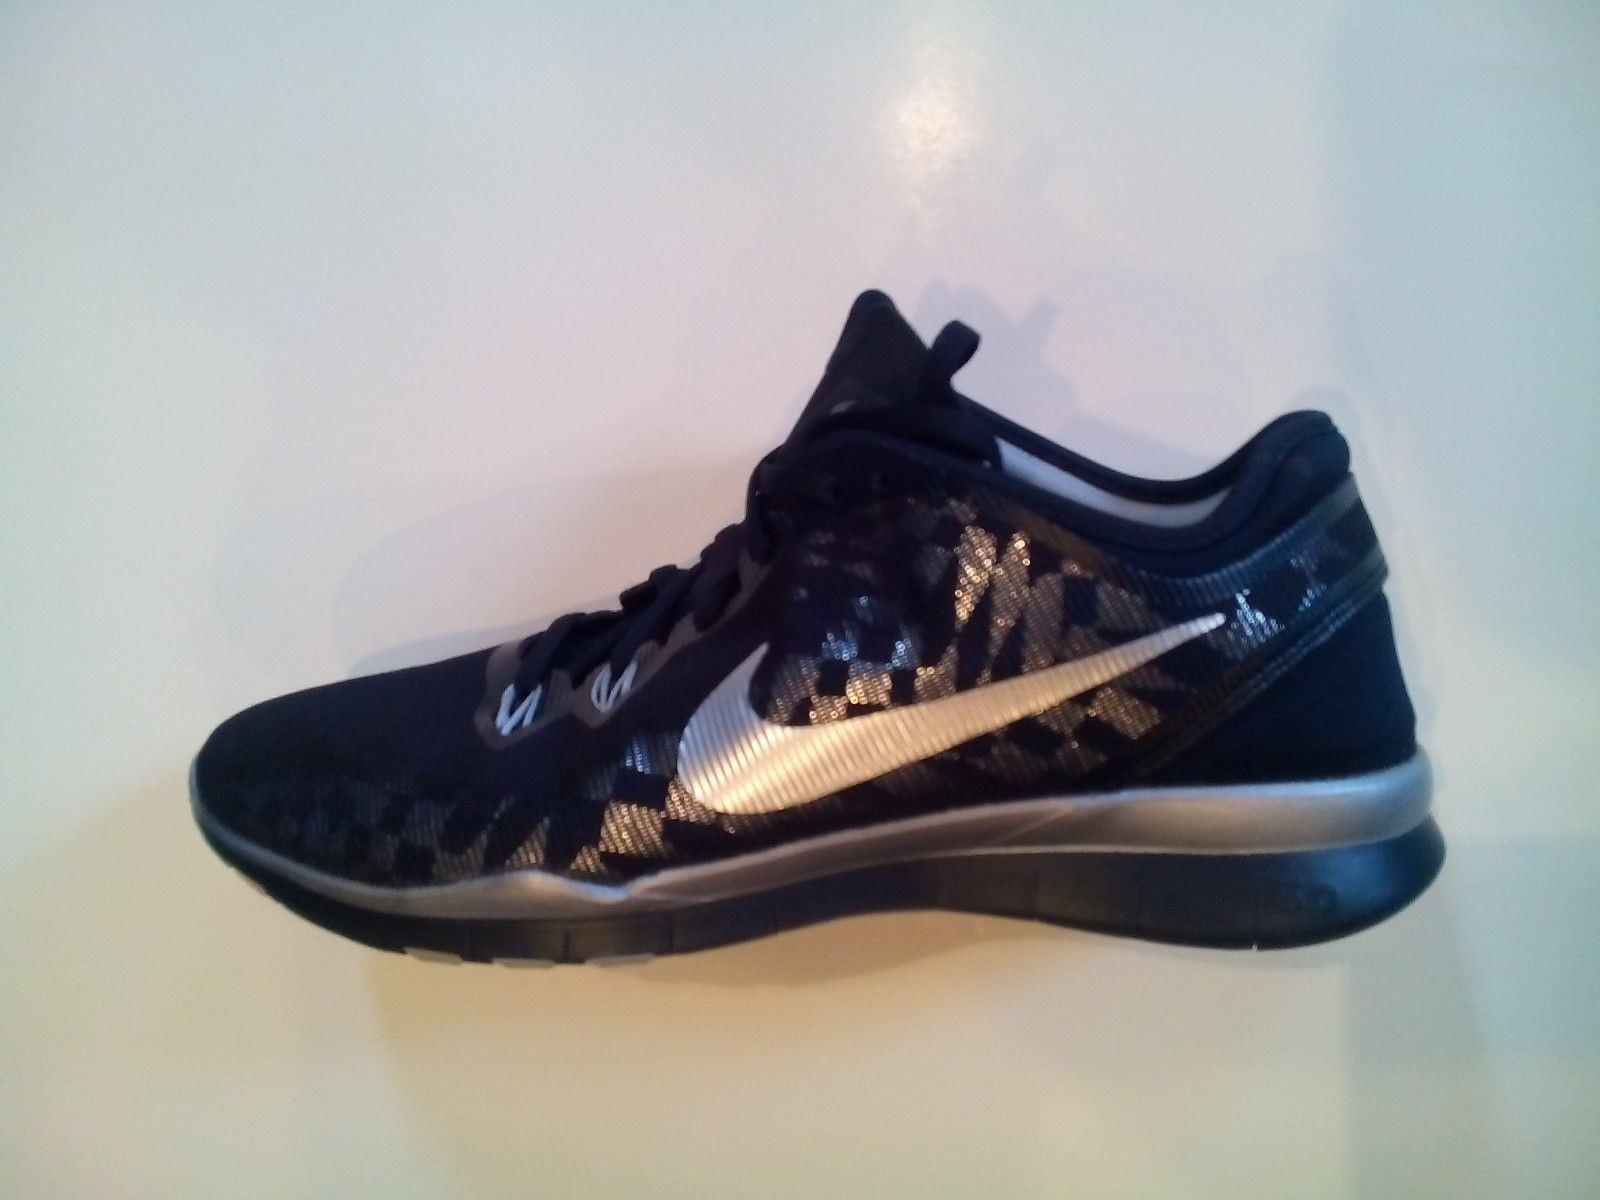 a47aa6bc7a8c NIKE Free 5.0 TR Fit5 MTLC Metallic Silver Women Training Shoe Sz 9.5 806277 -001